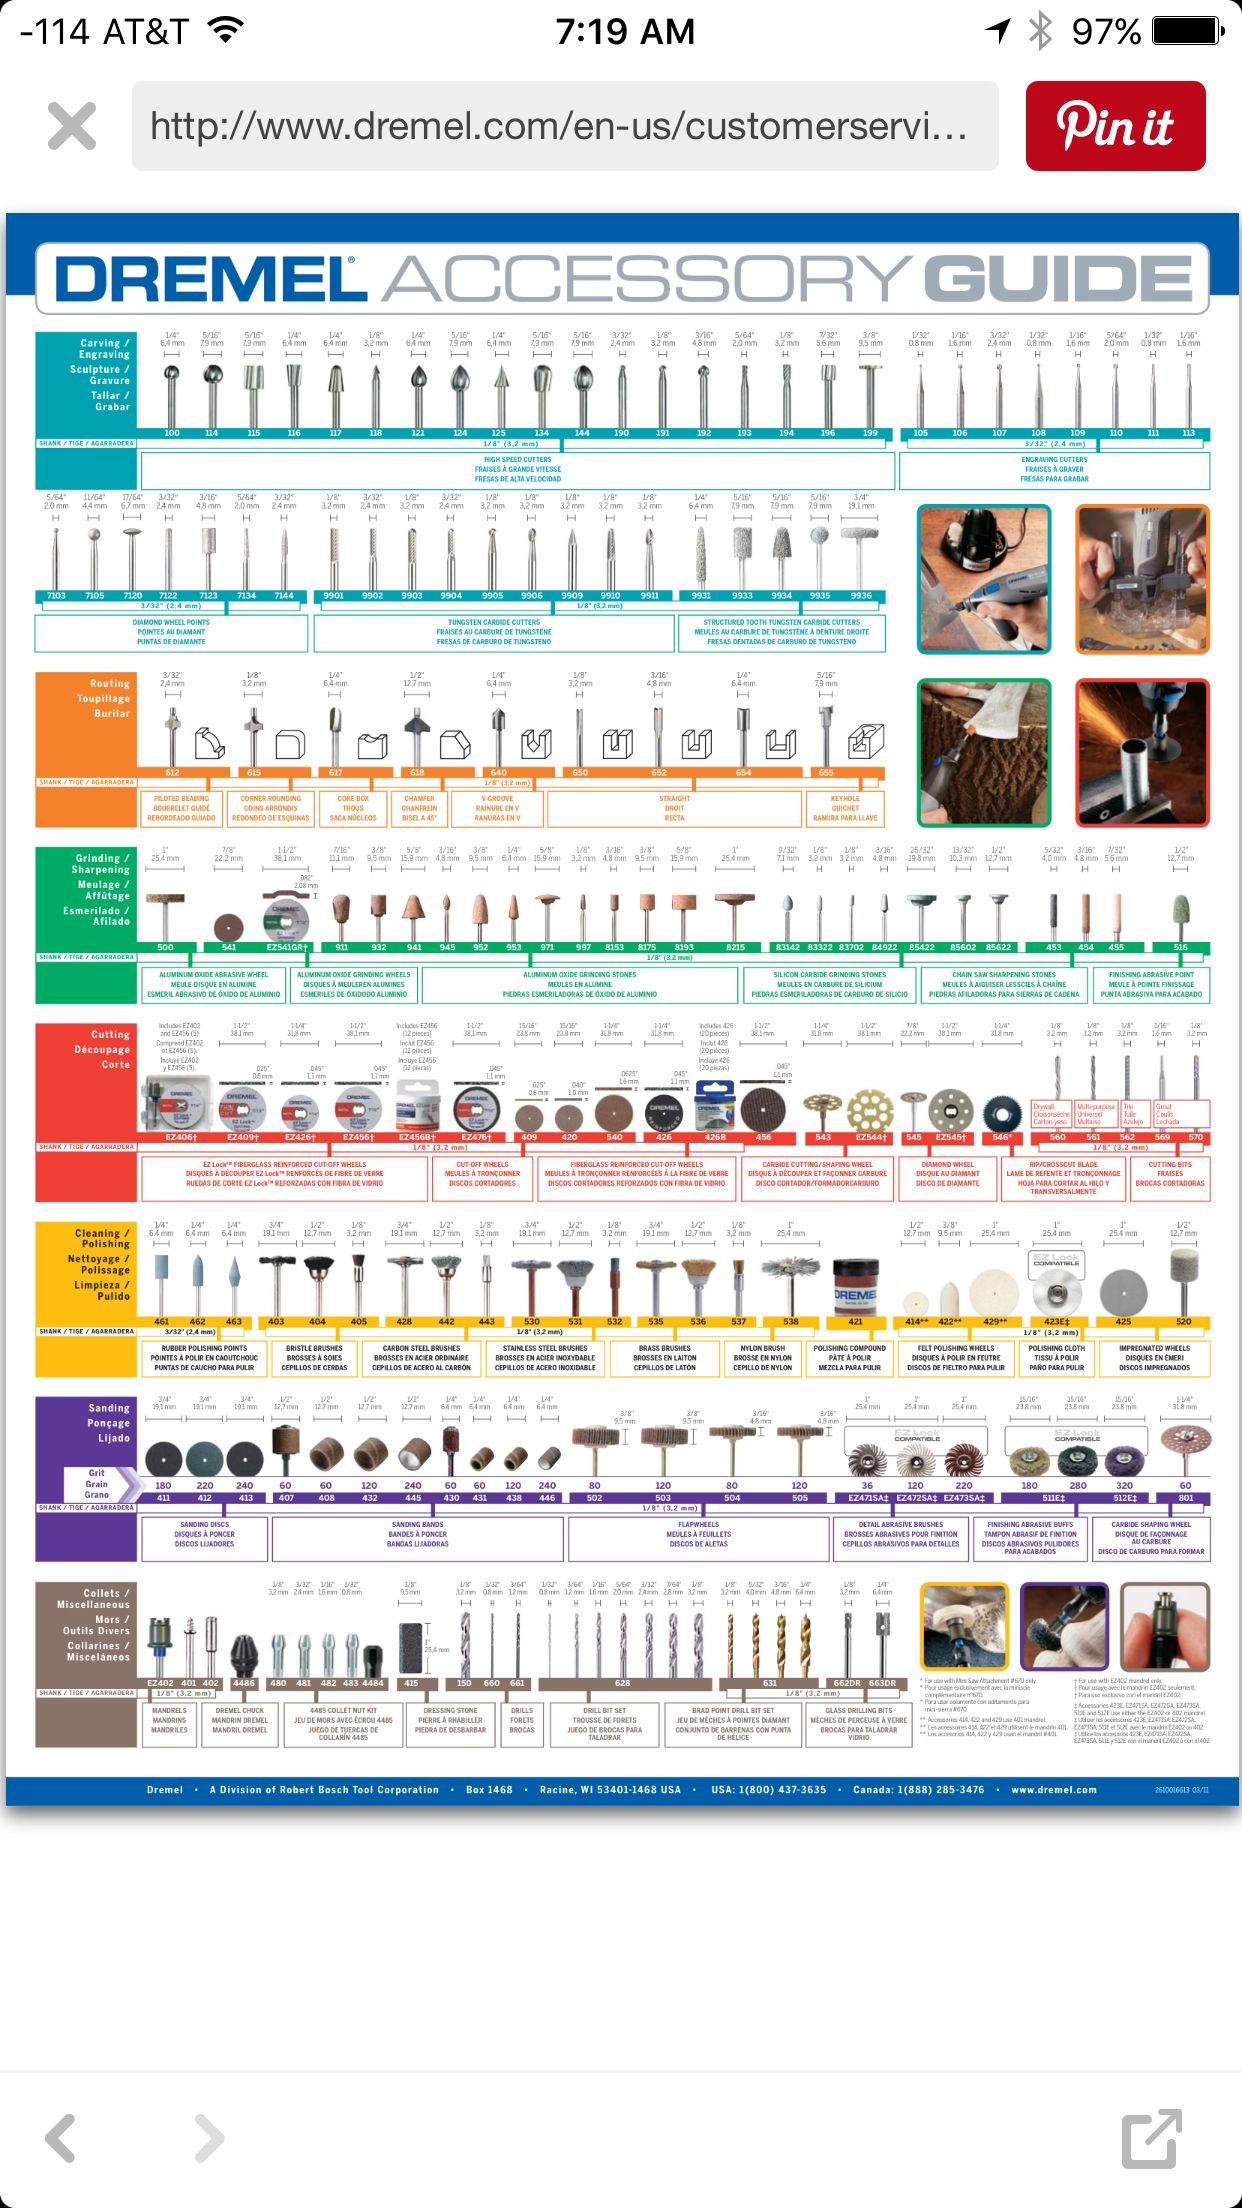 dremel chart of dreams dremel pinterest dremel chart and dremel projects. Black Bedroom Furniture Sets. Home Design Ideas